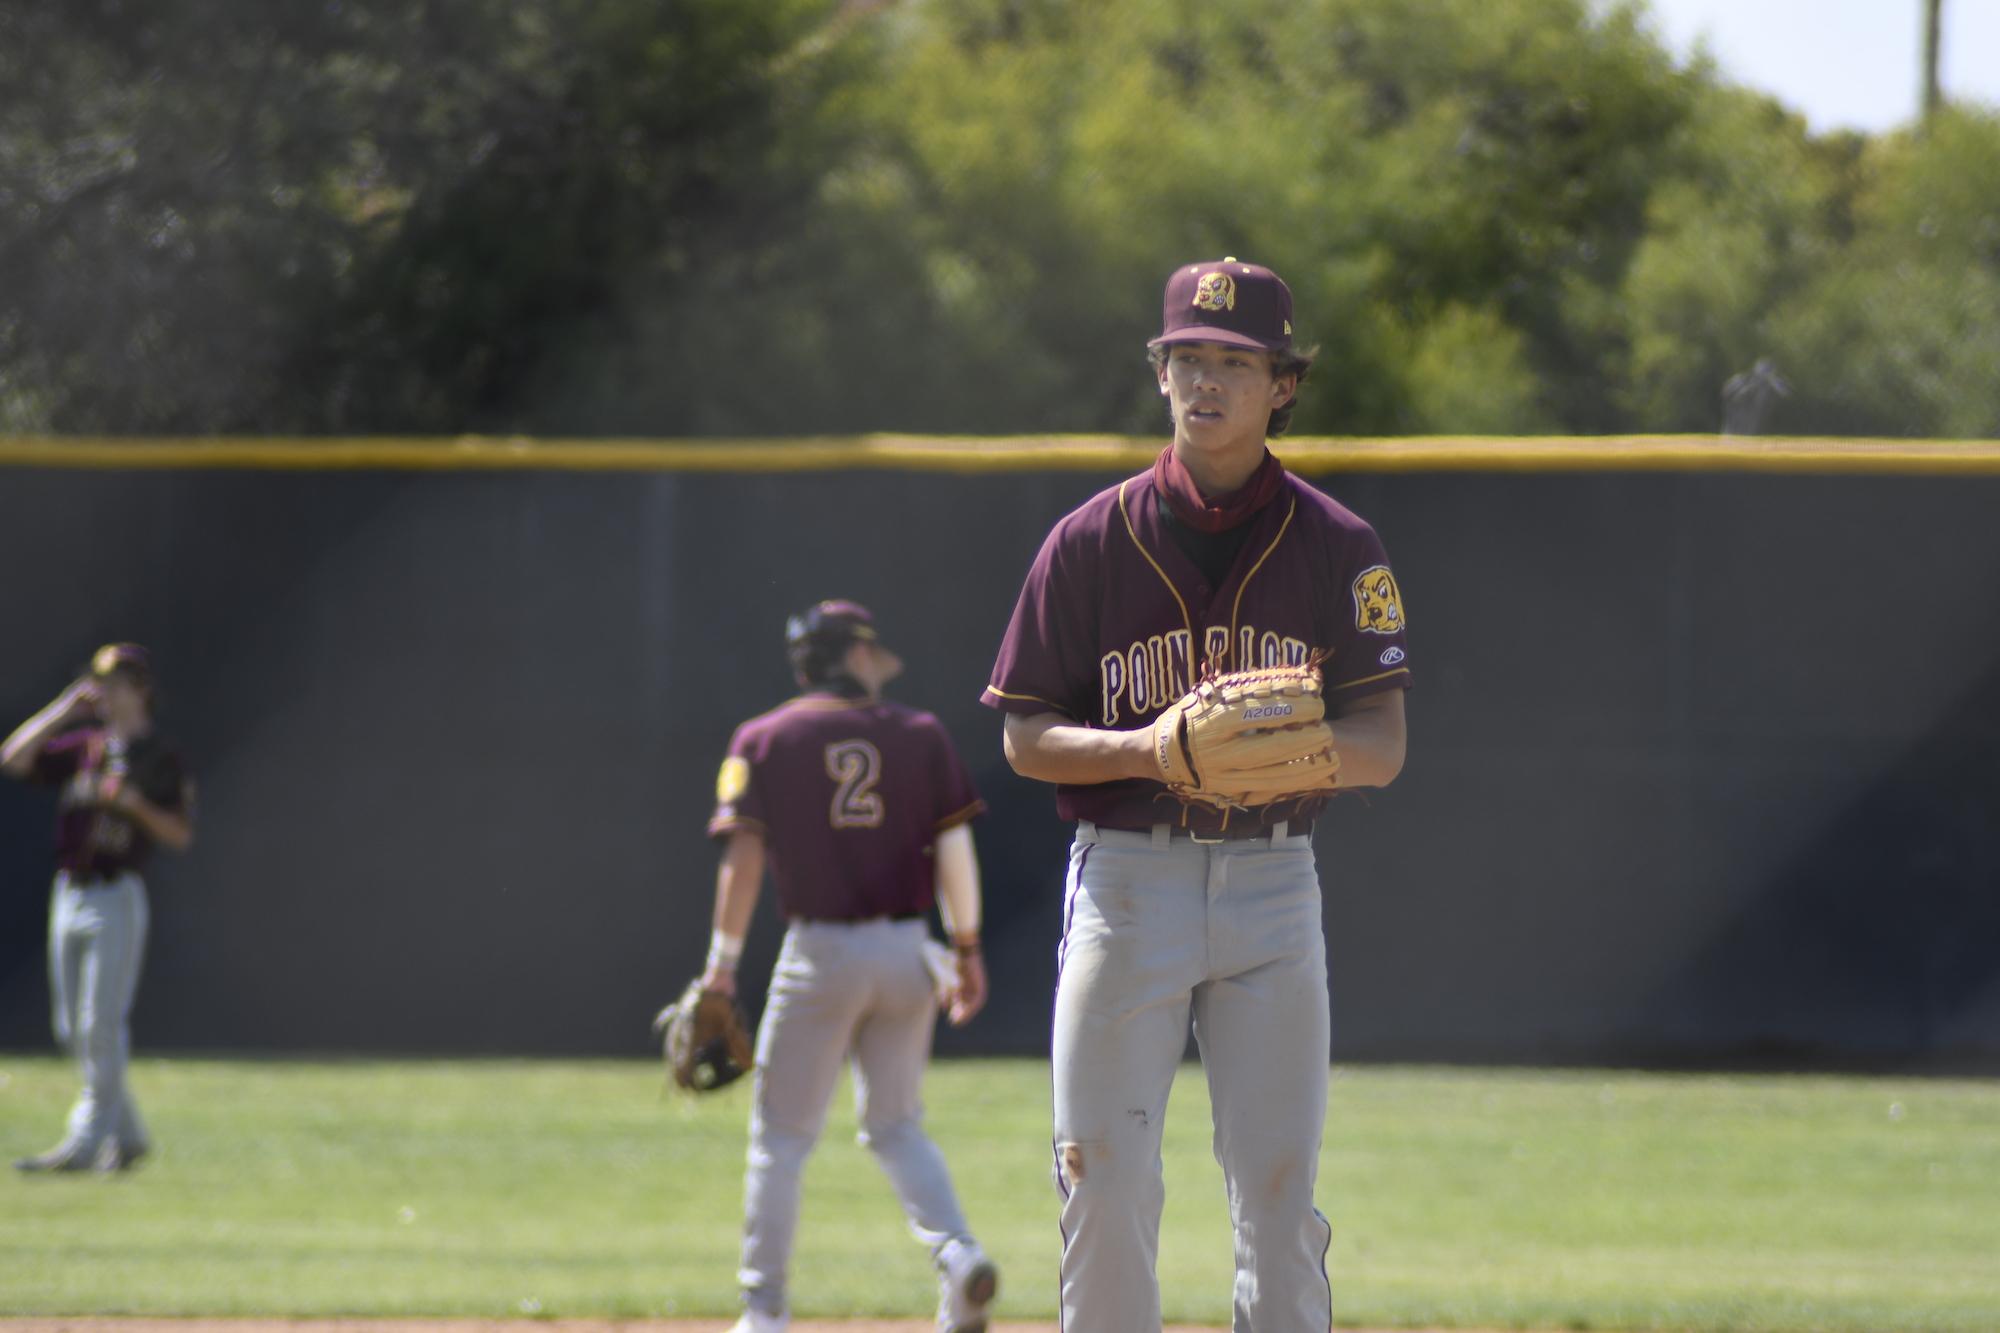 Photos: Point Loma baseball outlasts Torrey Pines 2-0 in 2021 season opener - High School Sports News, Scores, Videos, Rankings - SBLive